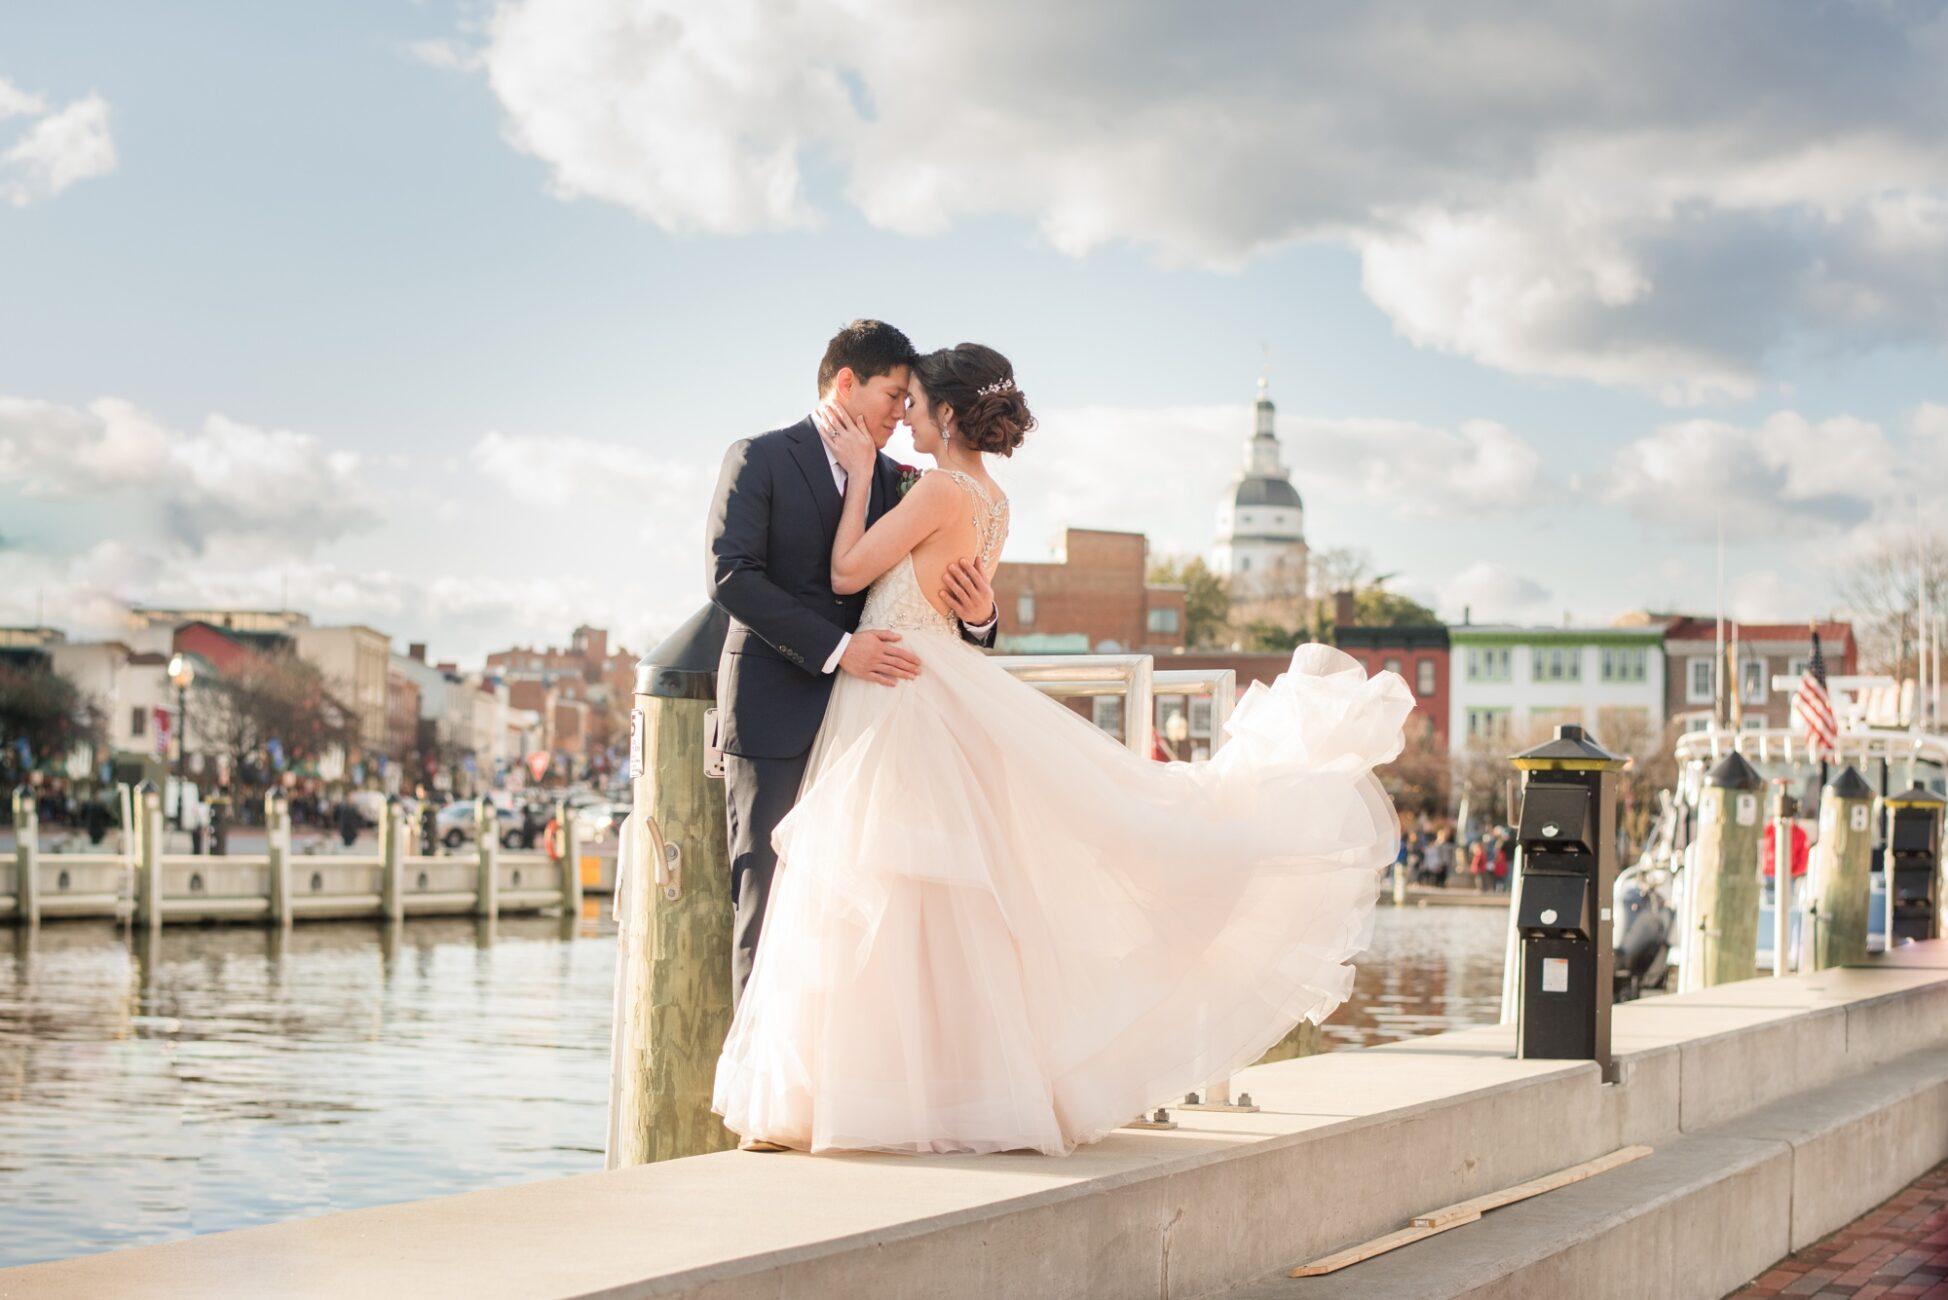 Historic Inns of Annapolis wedding